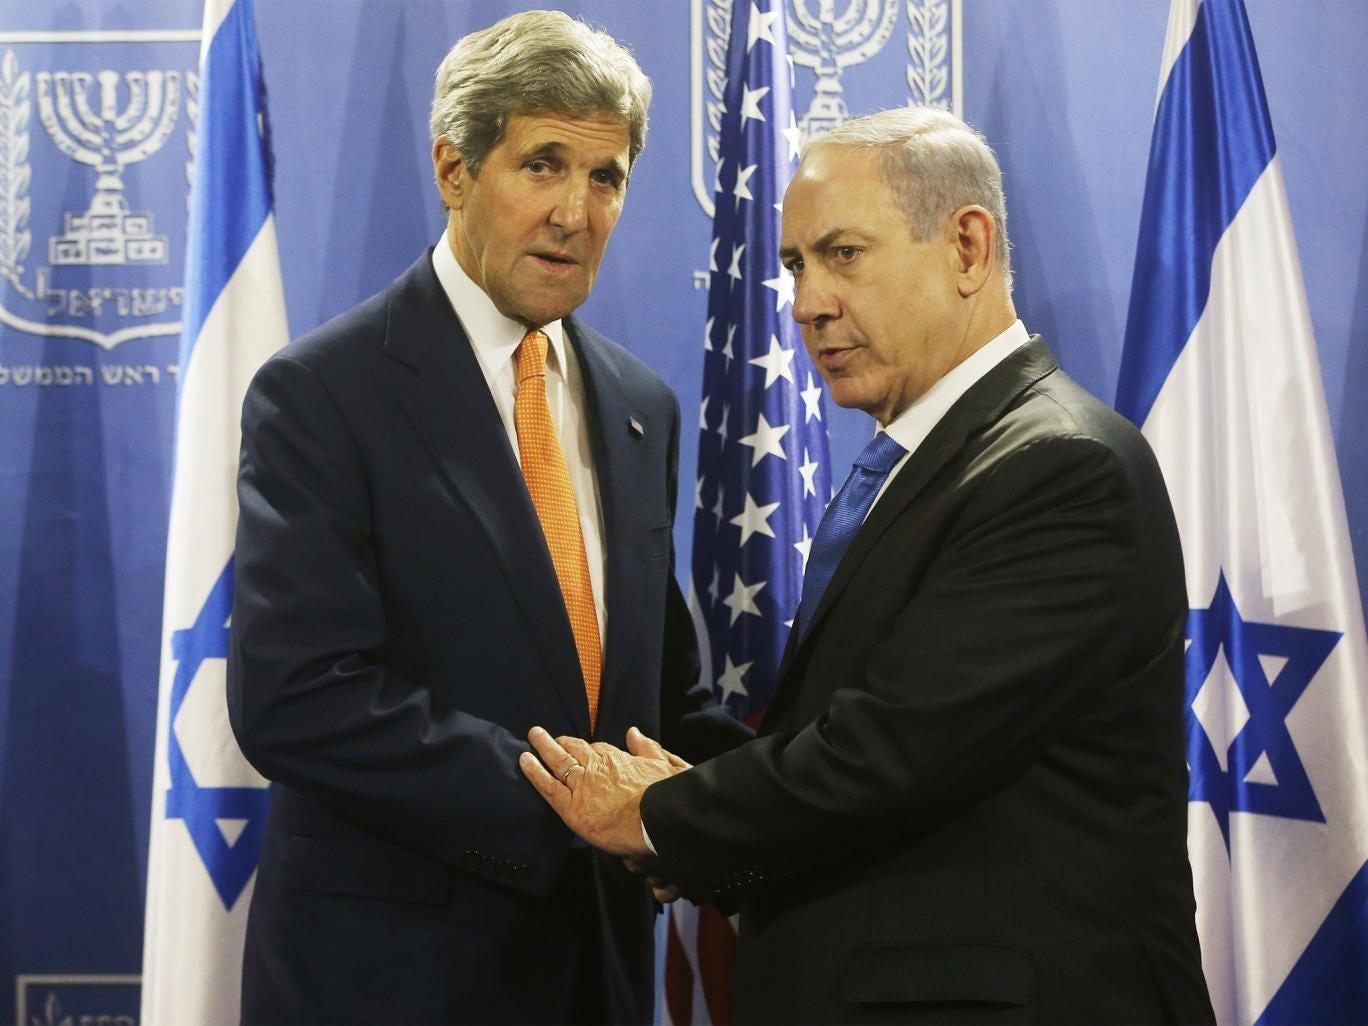 John Kerry meets with Israeli Prime Minister Benjamin Netanyahu in Tel Aviv as part of diplomatic efforts